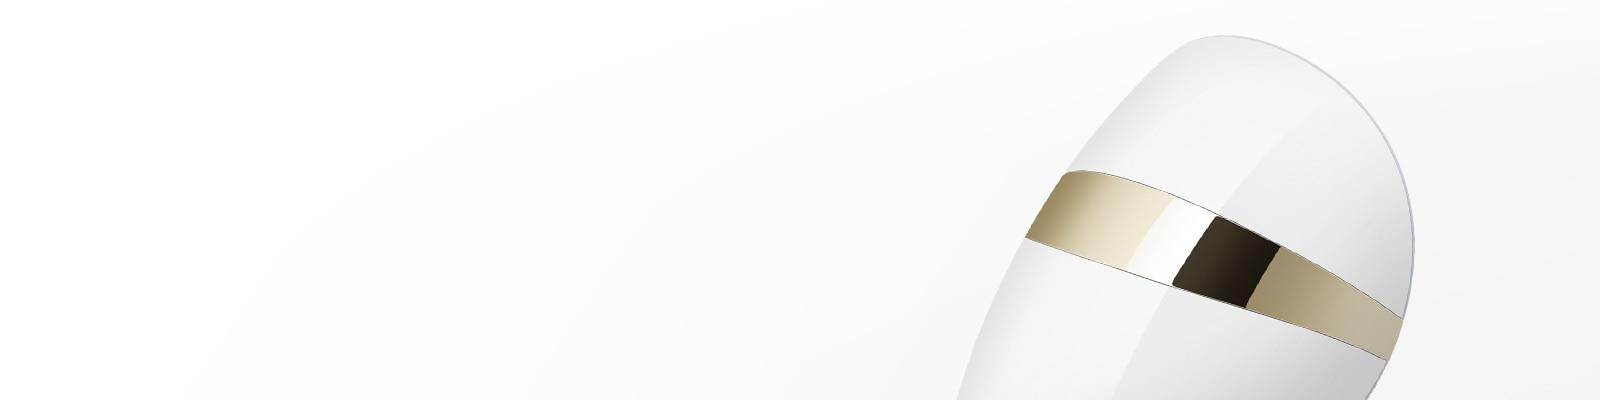 BLL1-PraL-LiftUpCare-09-LED-Mask-Desktop